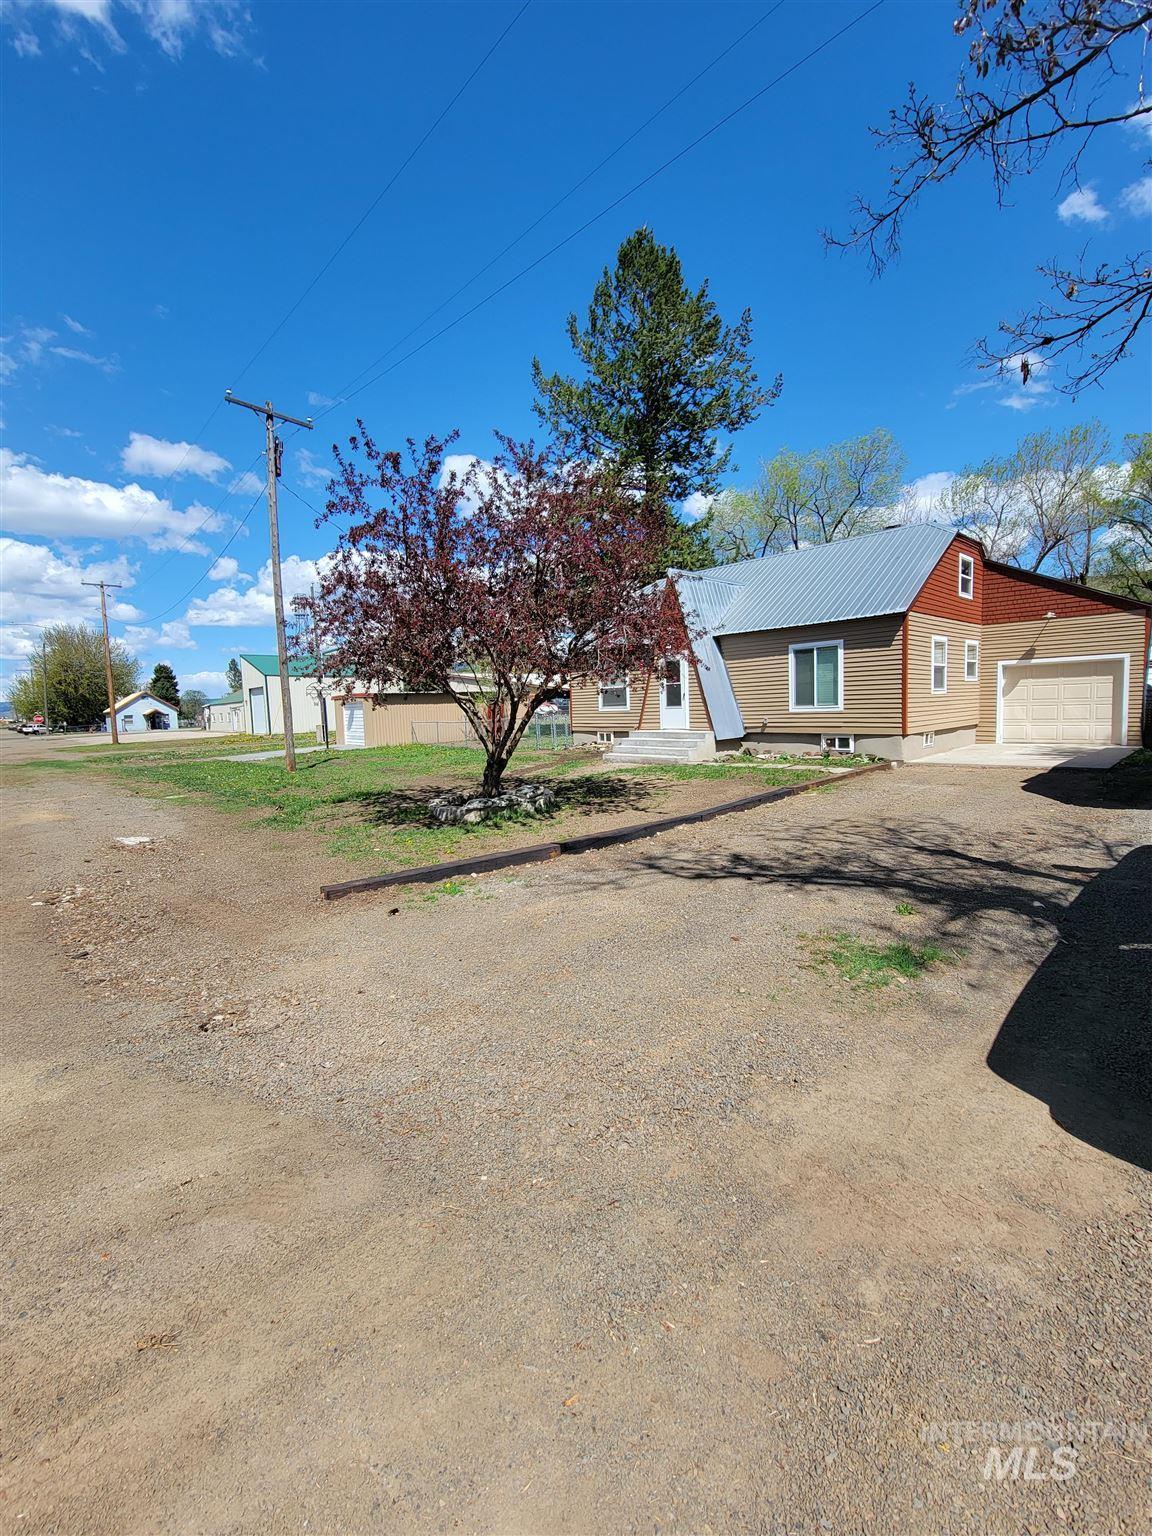 107 S Main St Property Photo